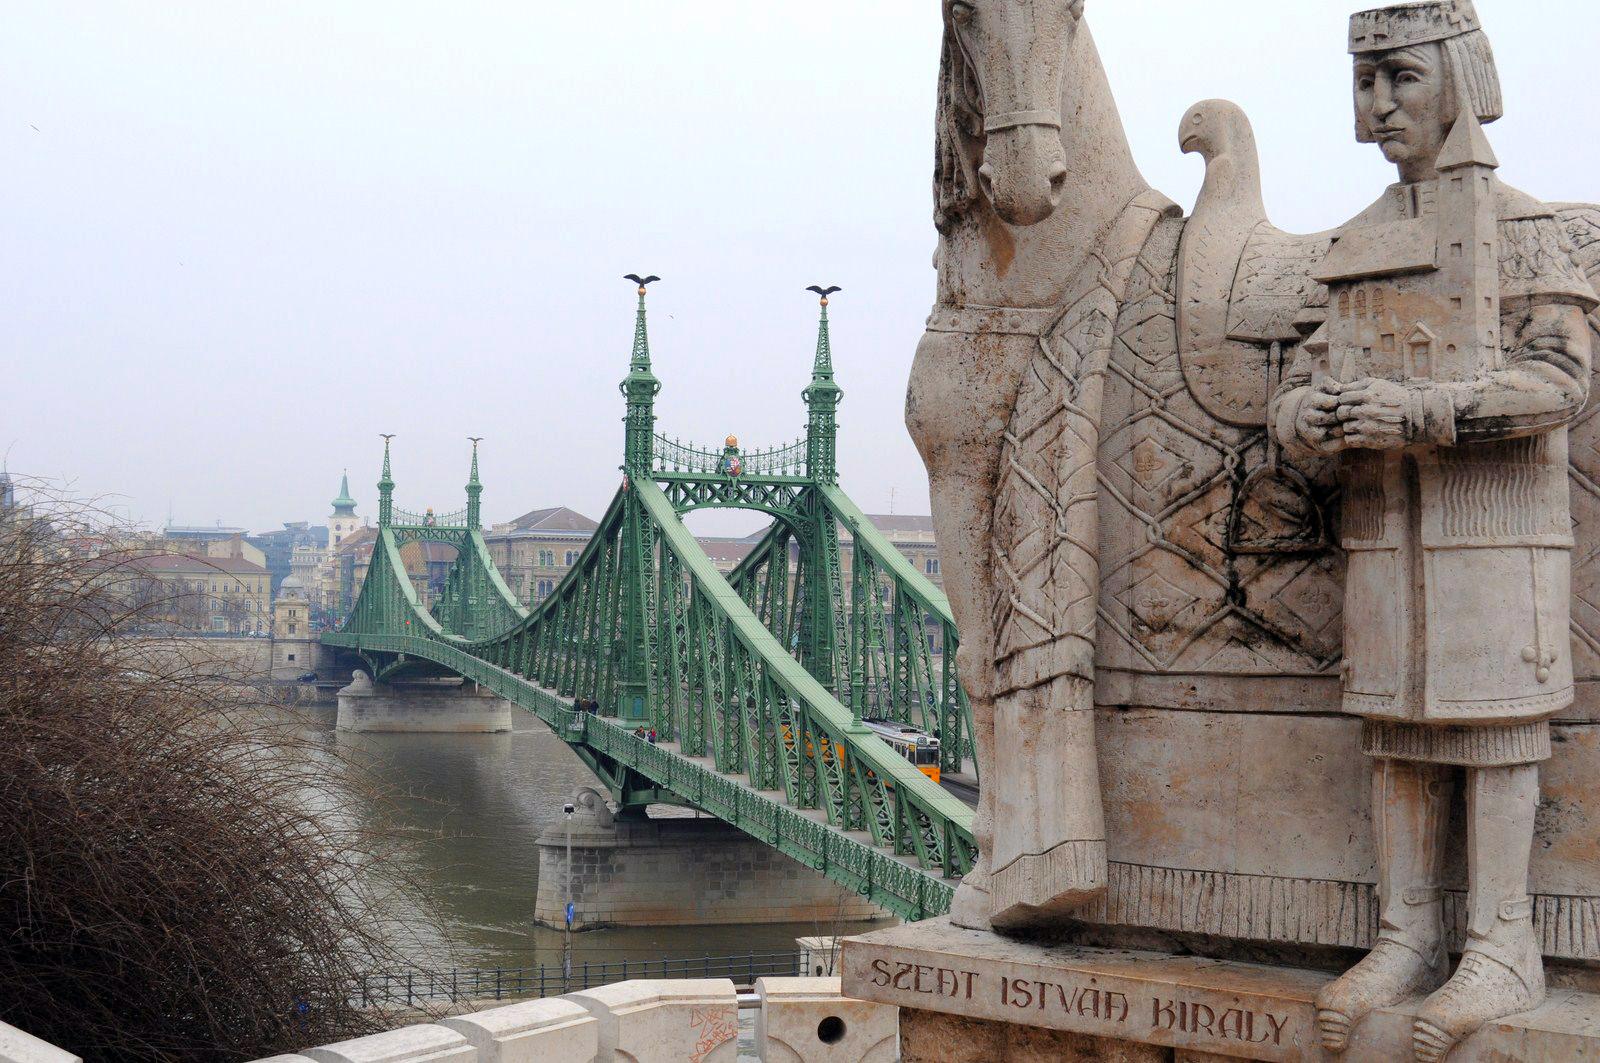 Qué ver en Budapest en un fin de semana: Puente de la Libertad en Budapest budapest en un fin de semana - 20799626684 93063946a5 o - Qué ver en Budapest en un fin de semana